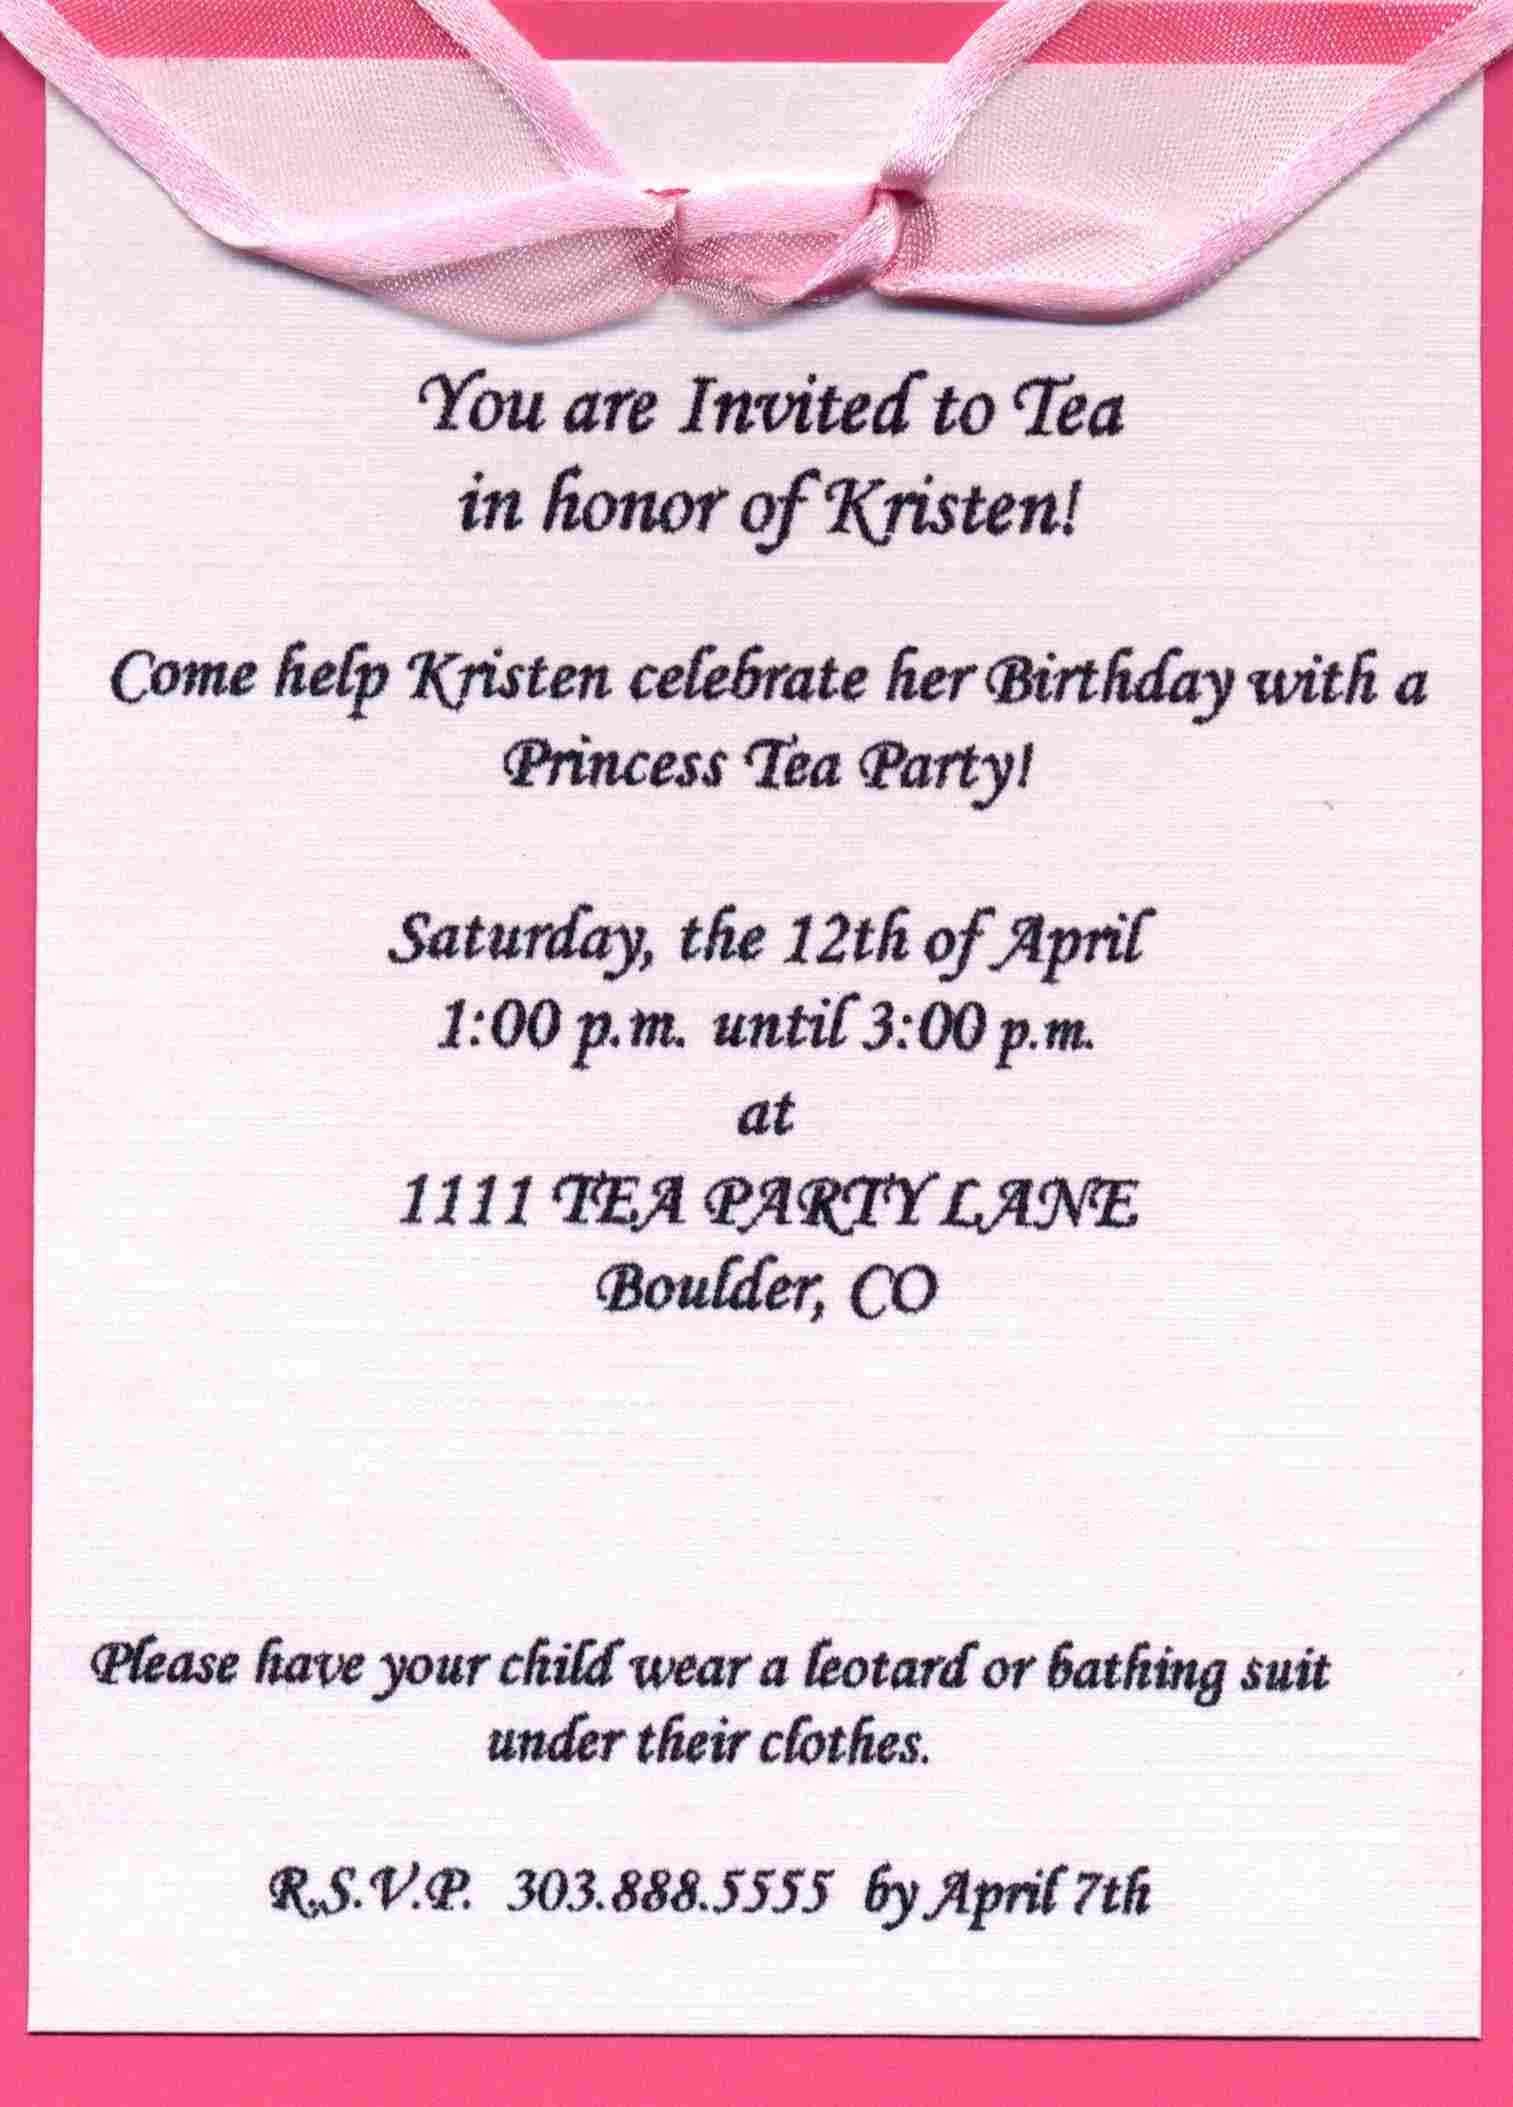 wedding invitation wording templates Top selection of